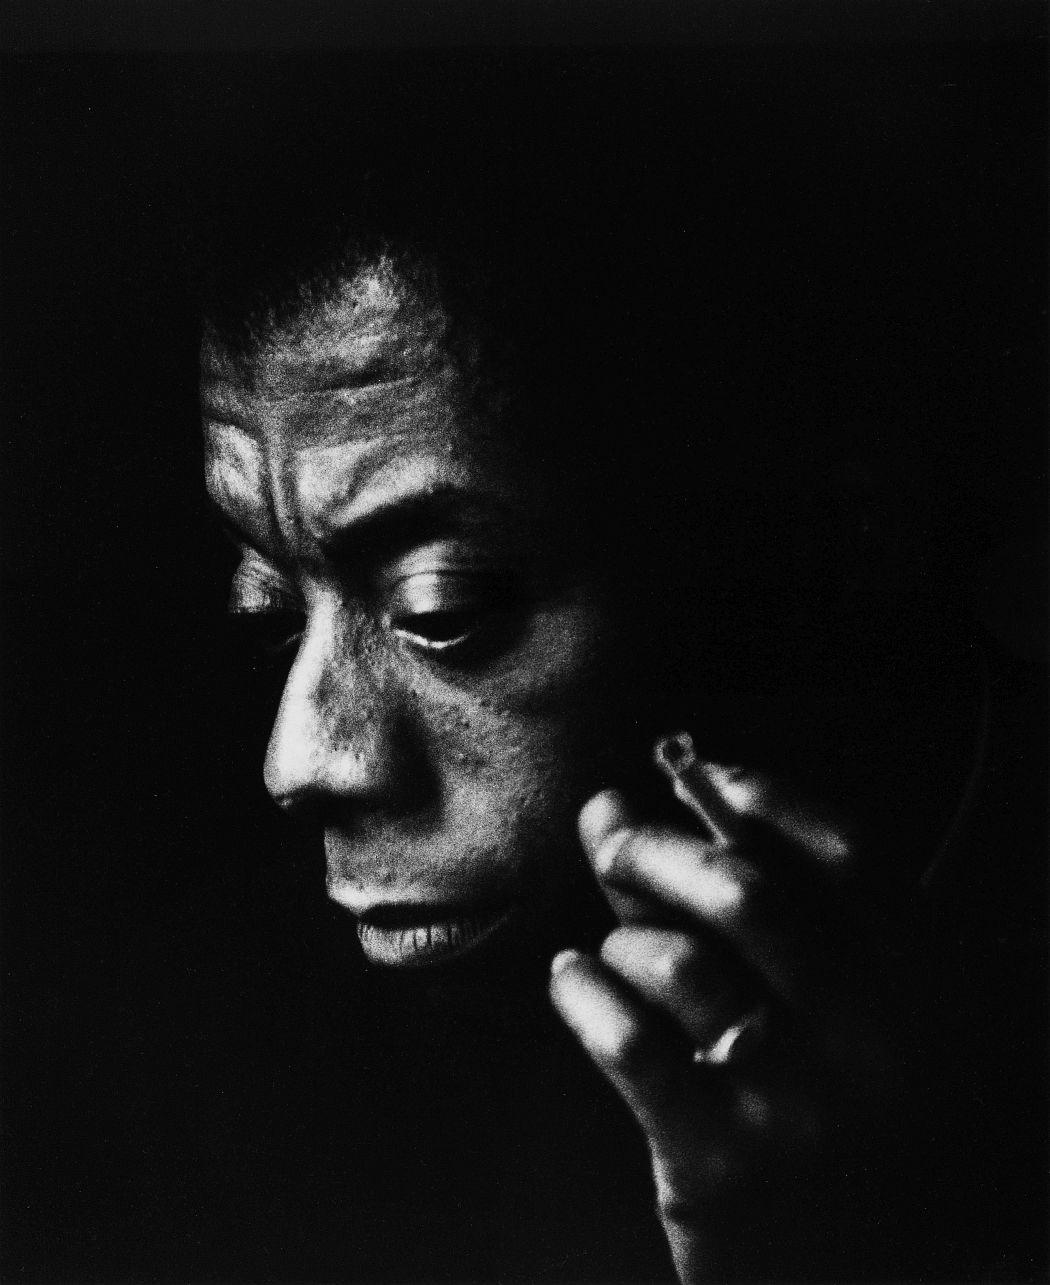 Maria Austria, Der amerikanische Schriftsteller James Baldwin Amsterdam 1965 © Maria Austria / Maria Austria Instituut